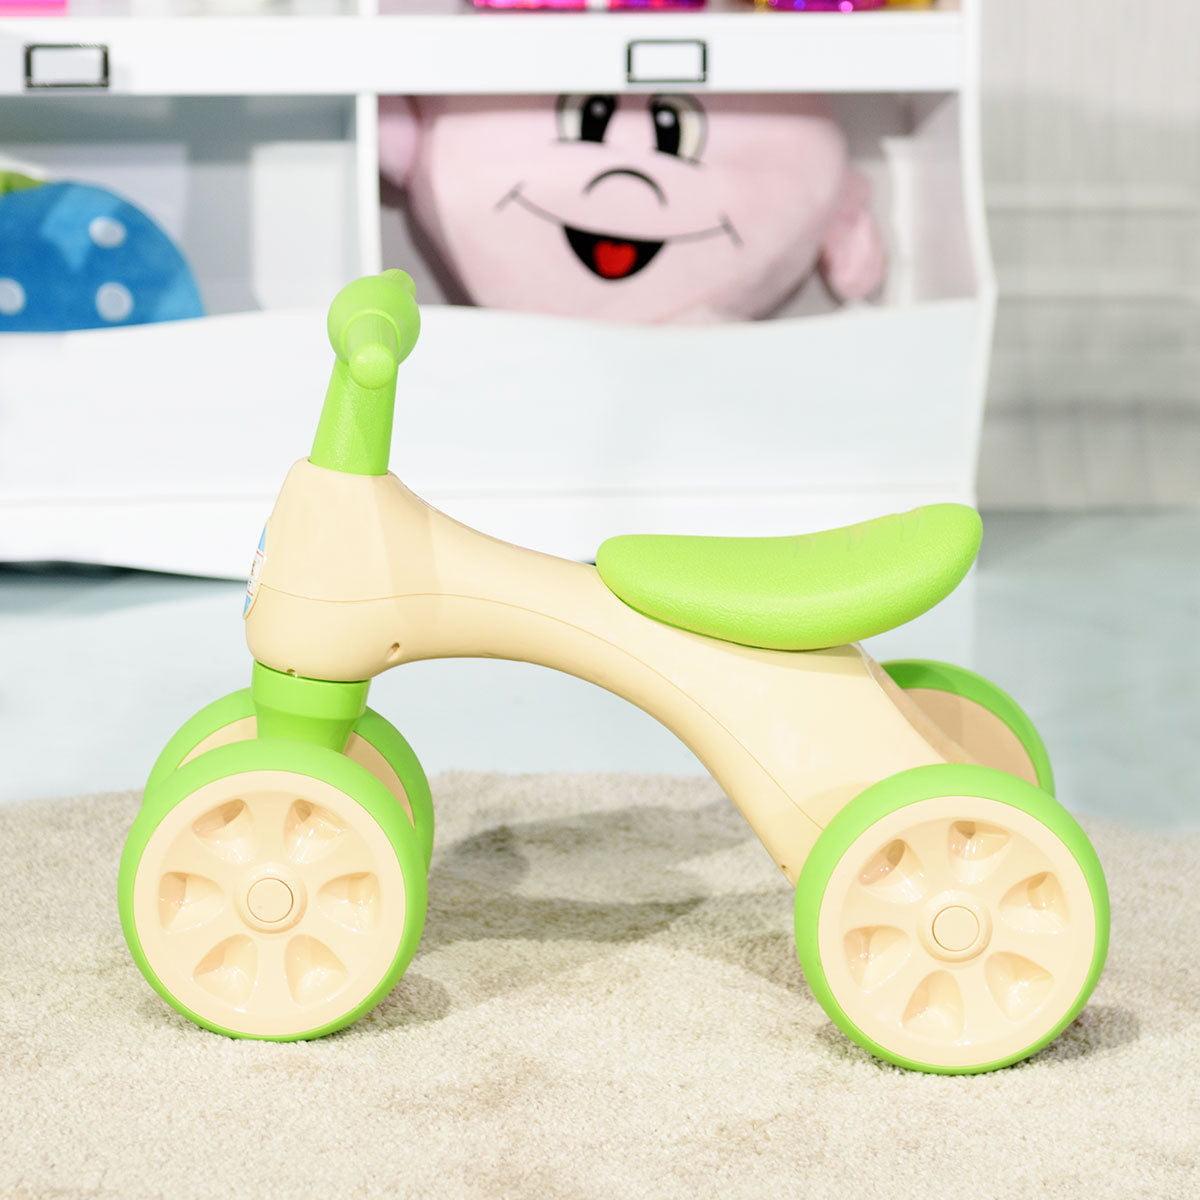 Costway Baby Balance Bike No Pedal Bicycle Children Walker 4 Wheels w/ Sound & Storage - image 6 de 10